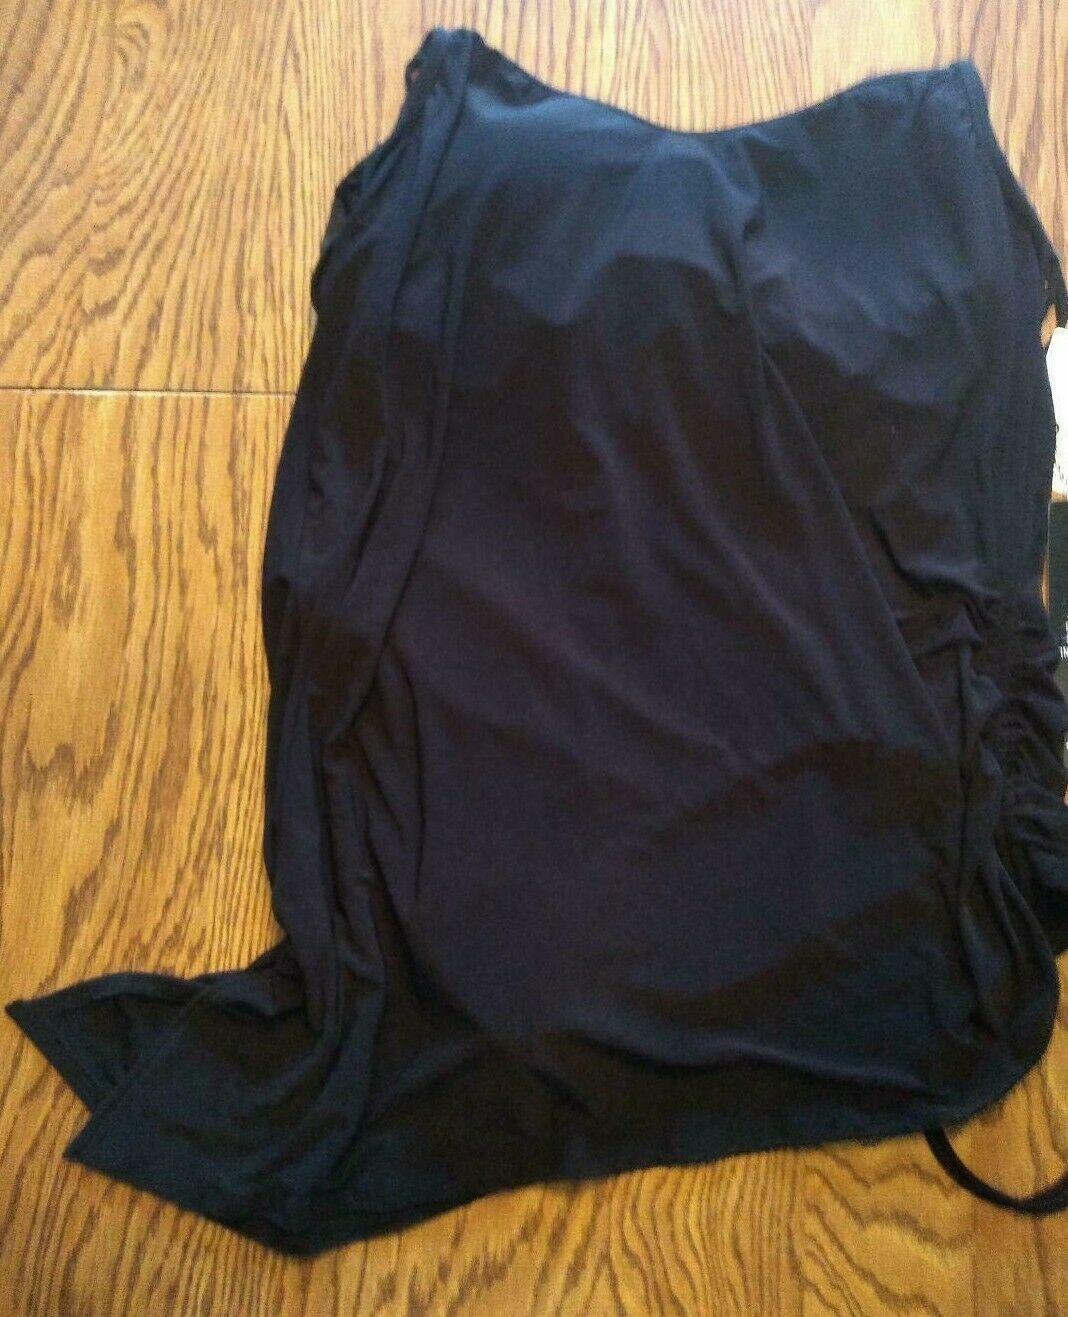 MagicSuit Black Under Wire One Piece Swimwear Size 14DD